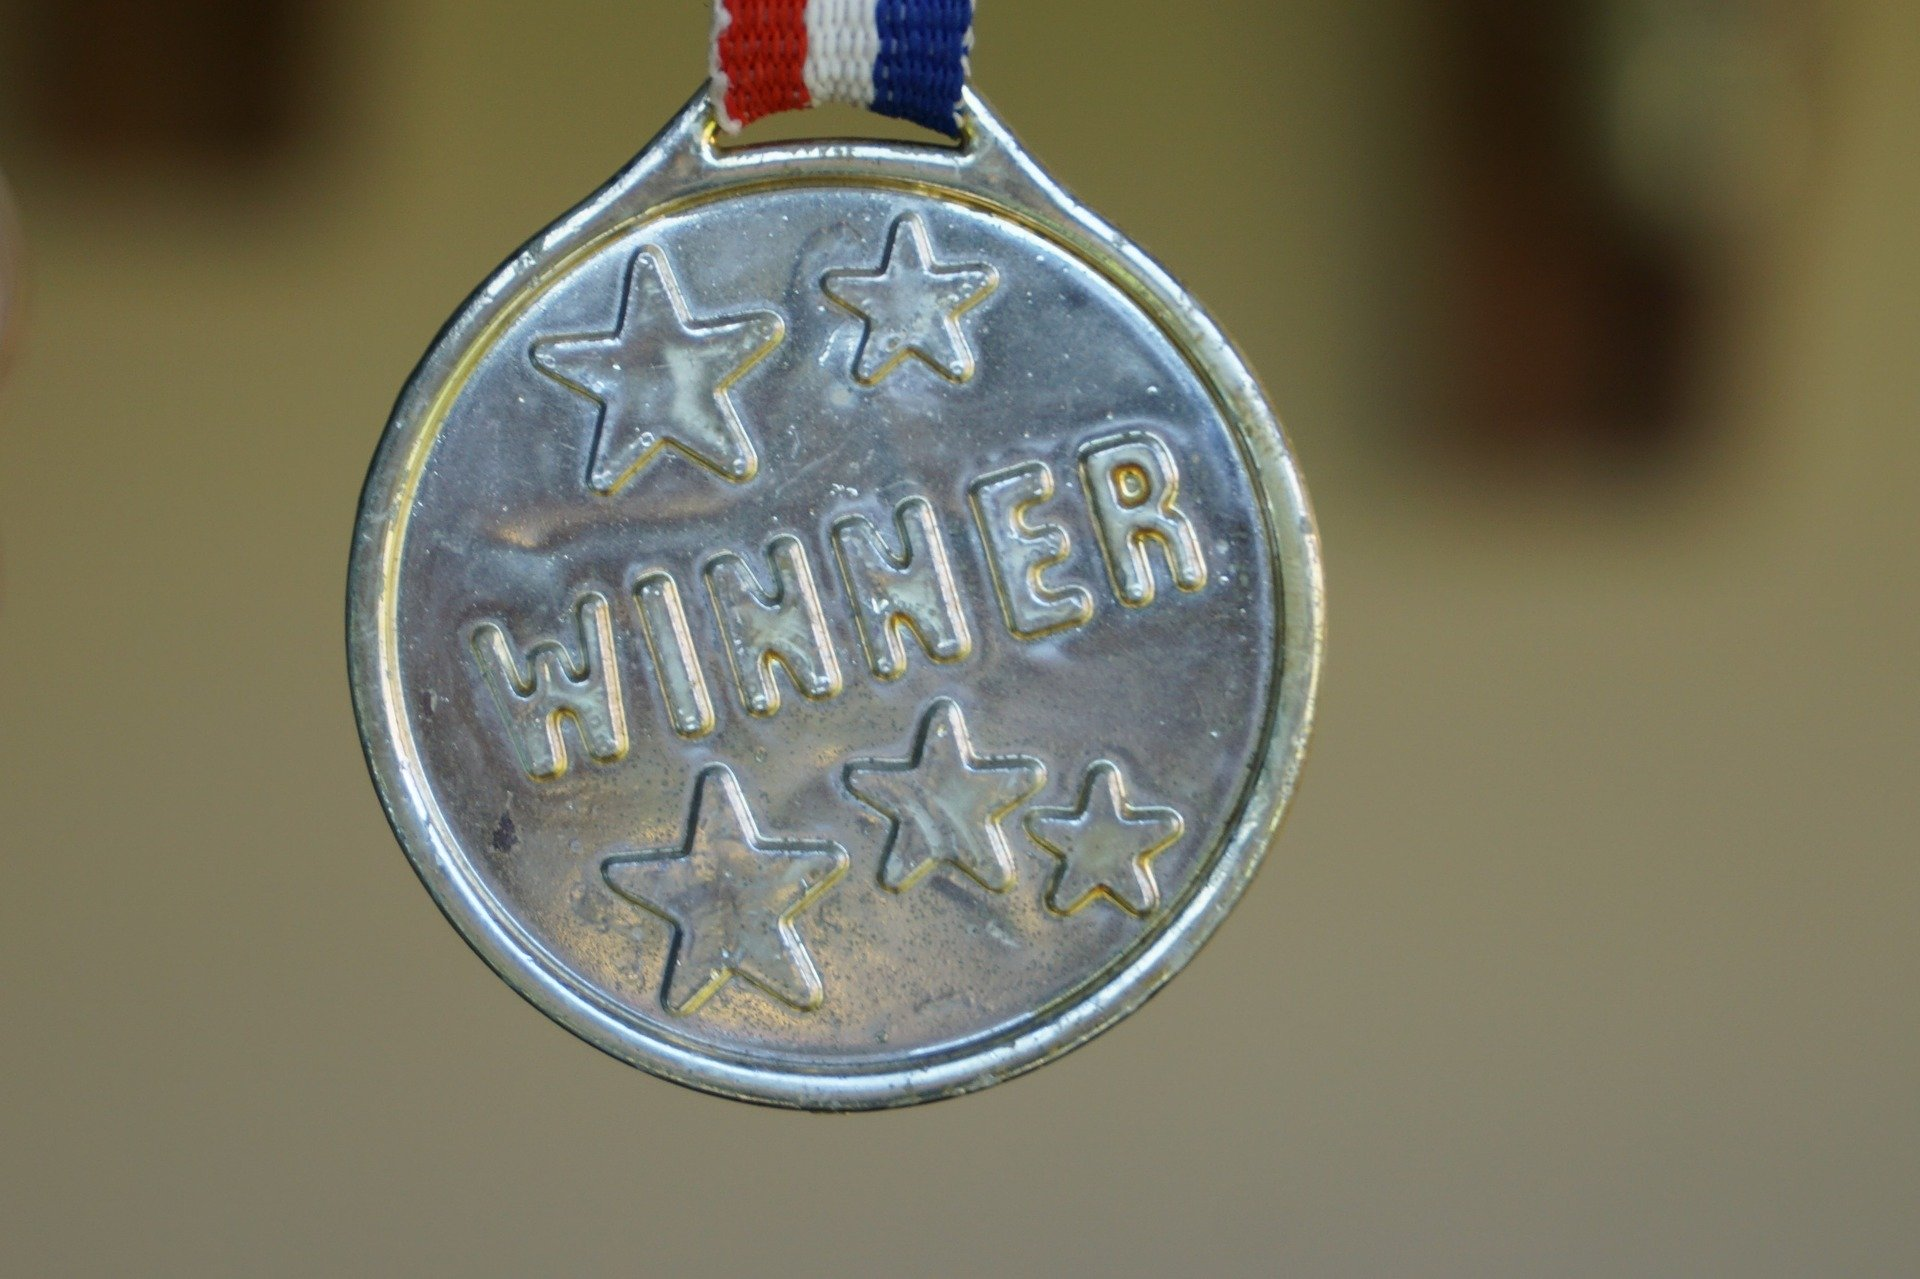 Erasmus Volunteering Awards